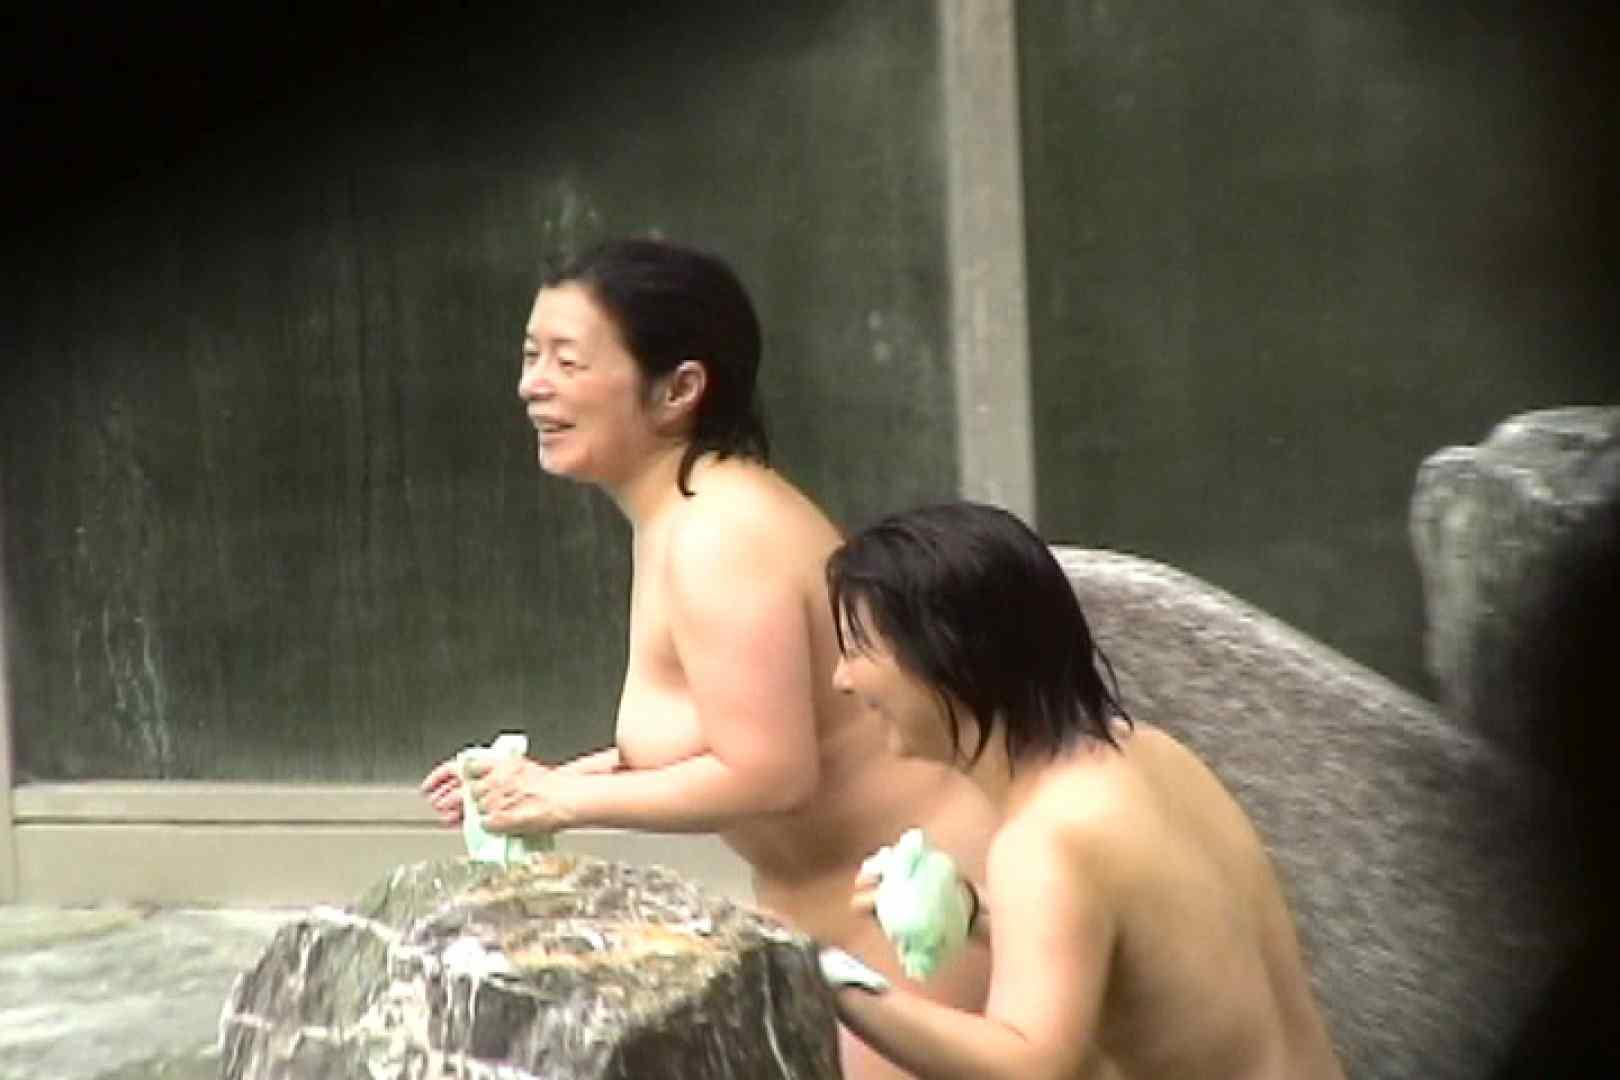 Aquaな露天風呂Vol.456 露天  47連発 18